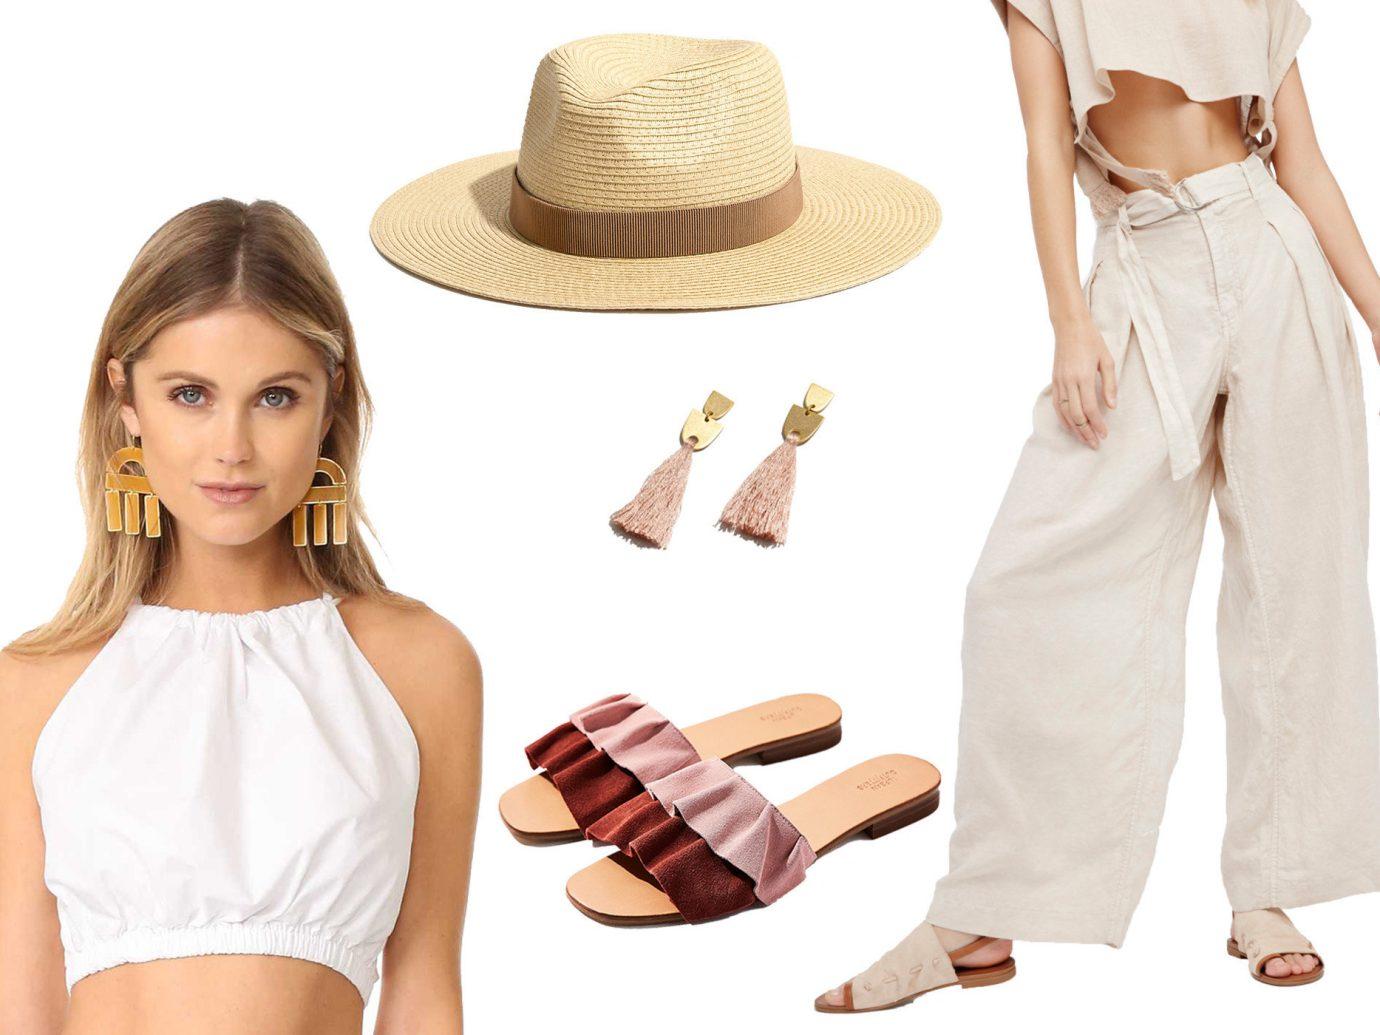 Style + Design person clothing product fashion accessory abdomen